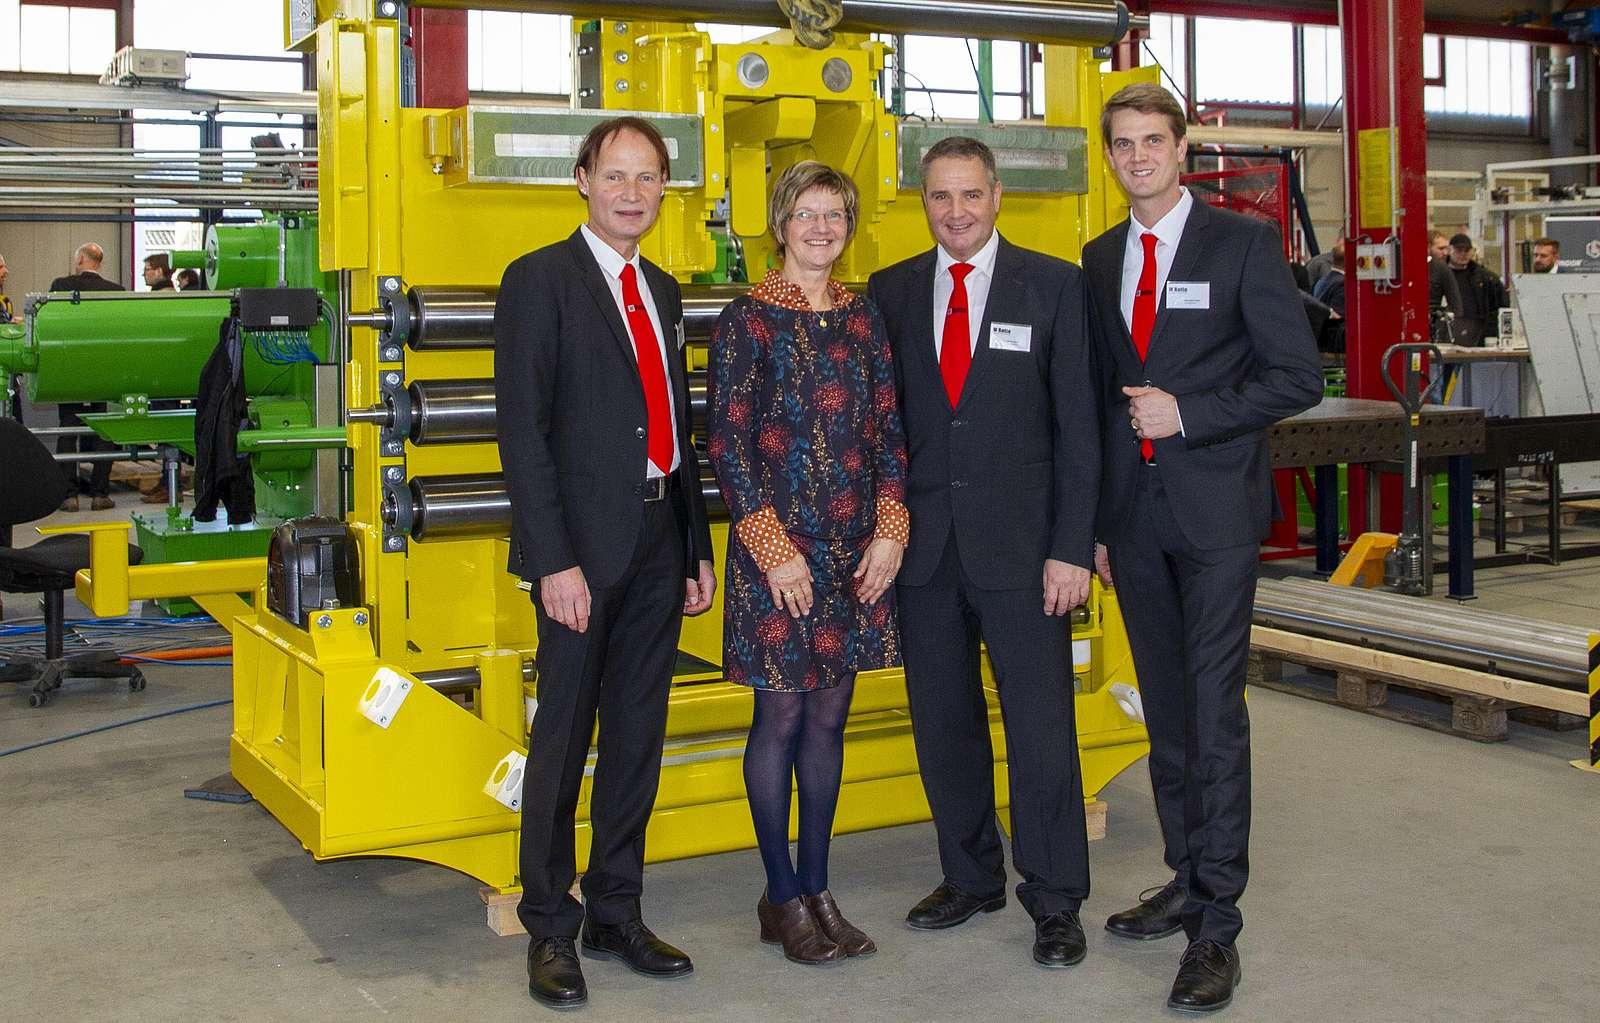 Produktschautag 2019 Dr. Franz-Barthold Gockel, Brigitte Rotte, Ulrich Rotte, Benedikt Rotte